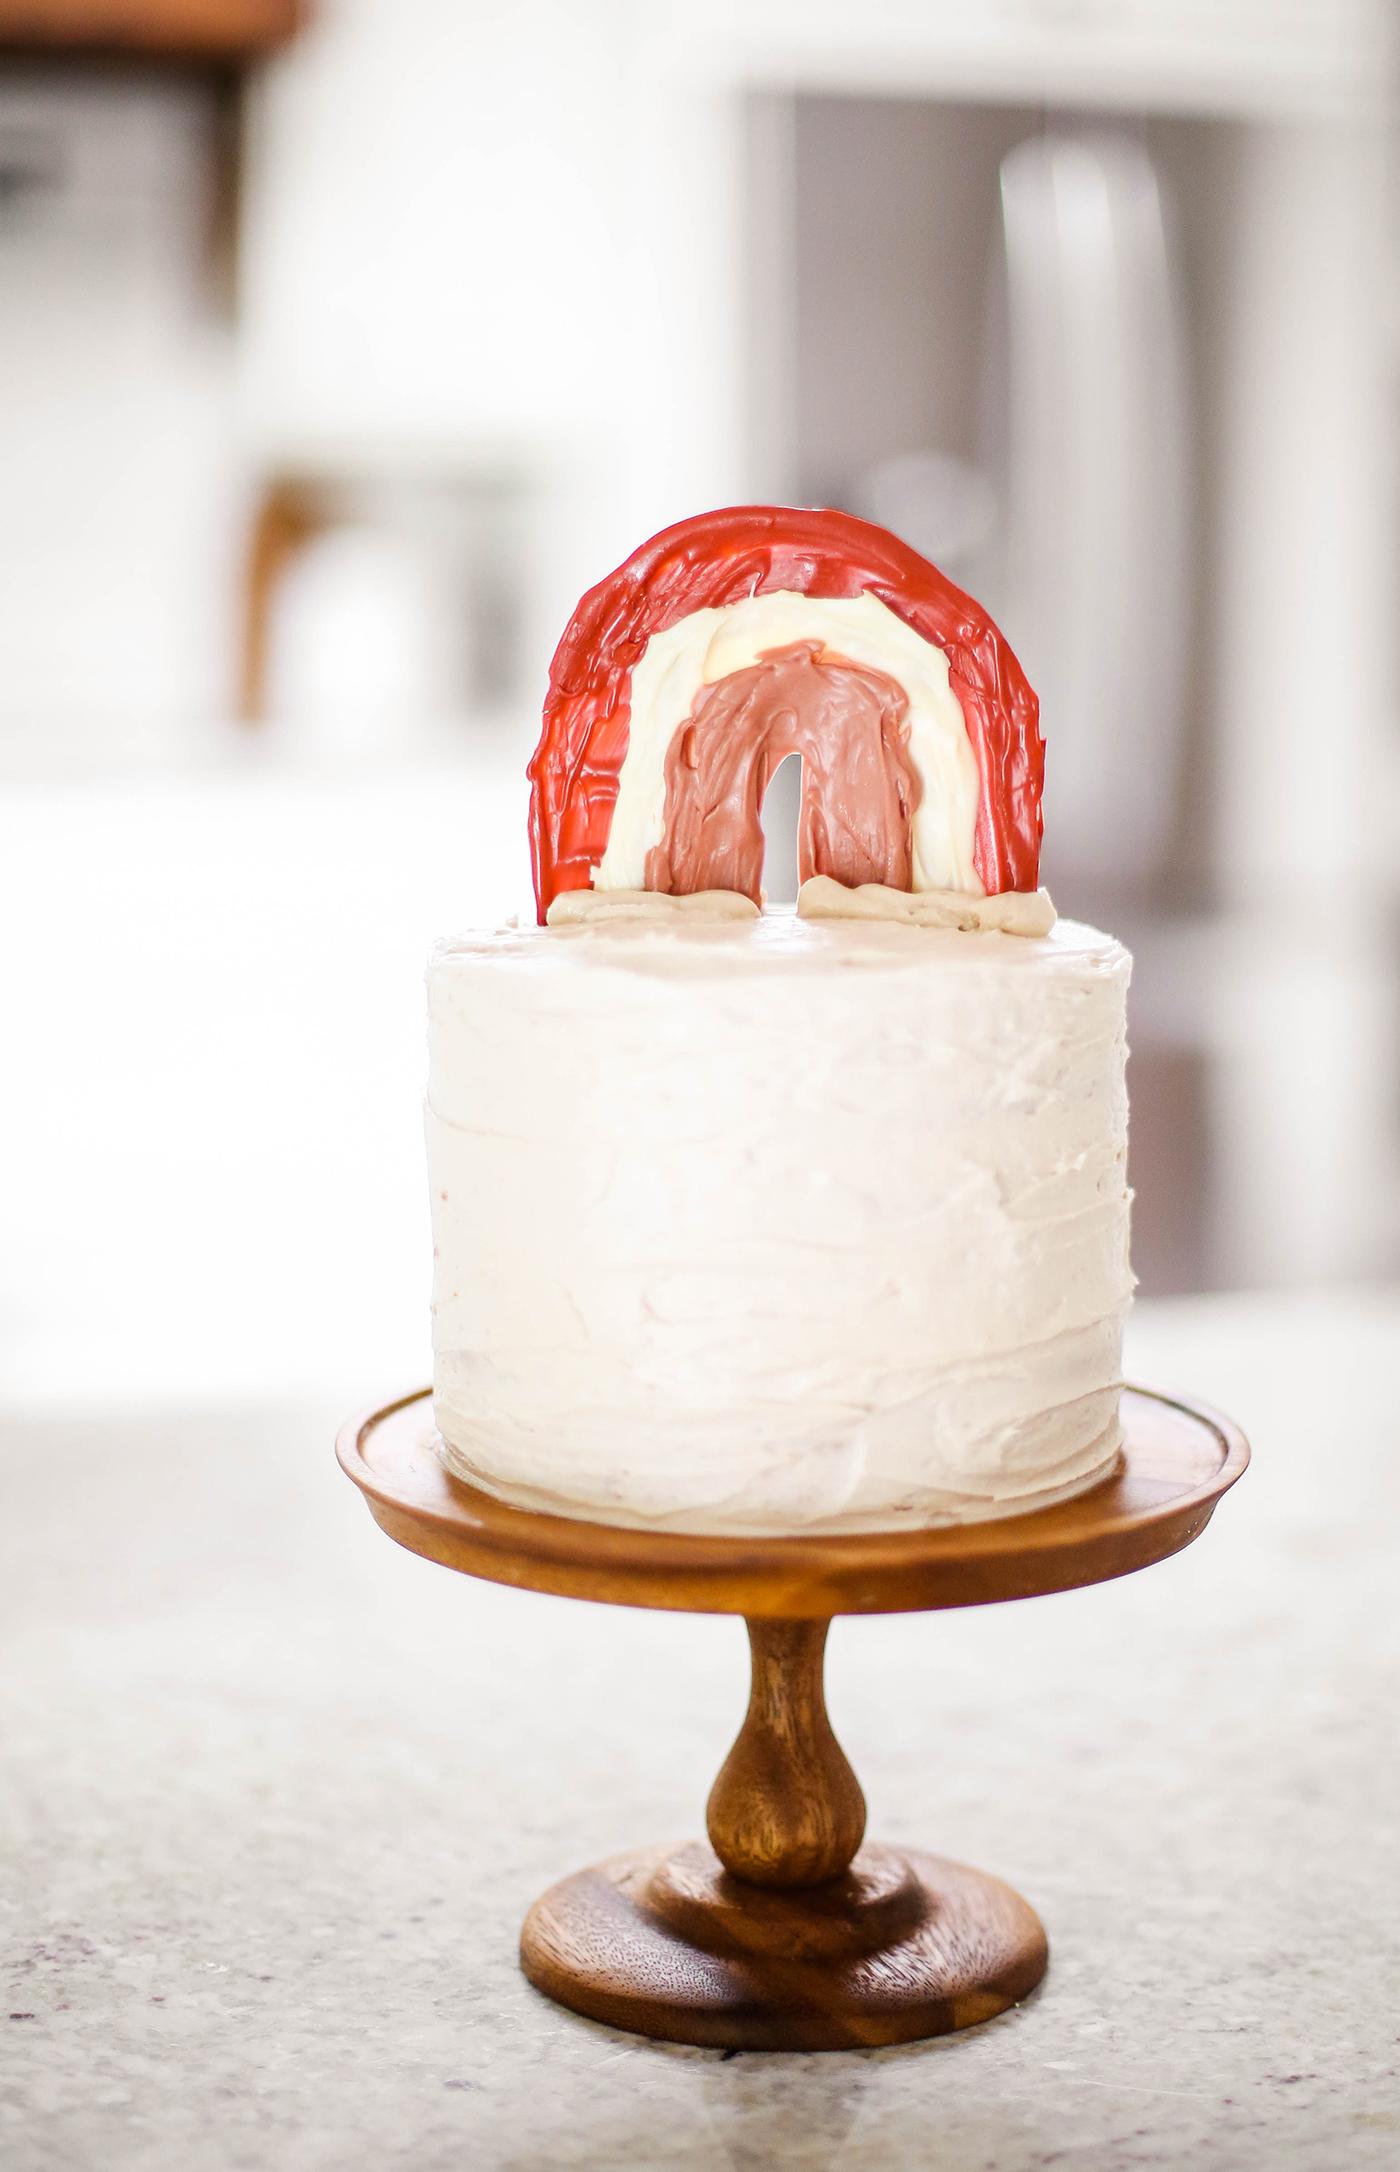 DIY chocolate rainbow cake topper on cake